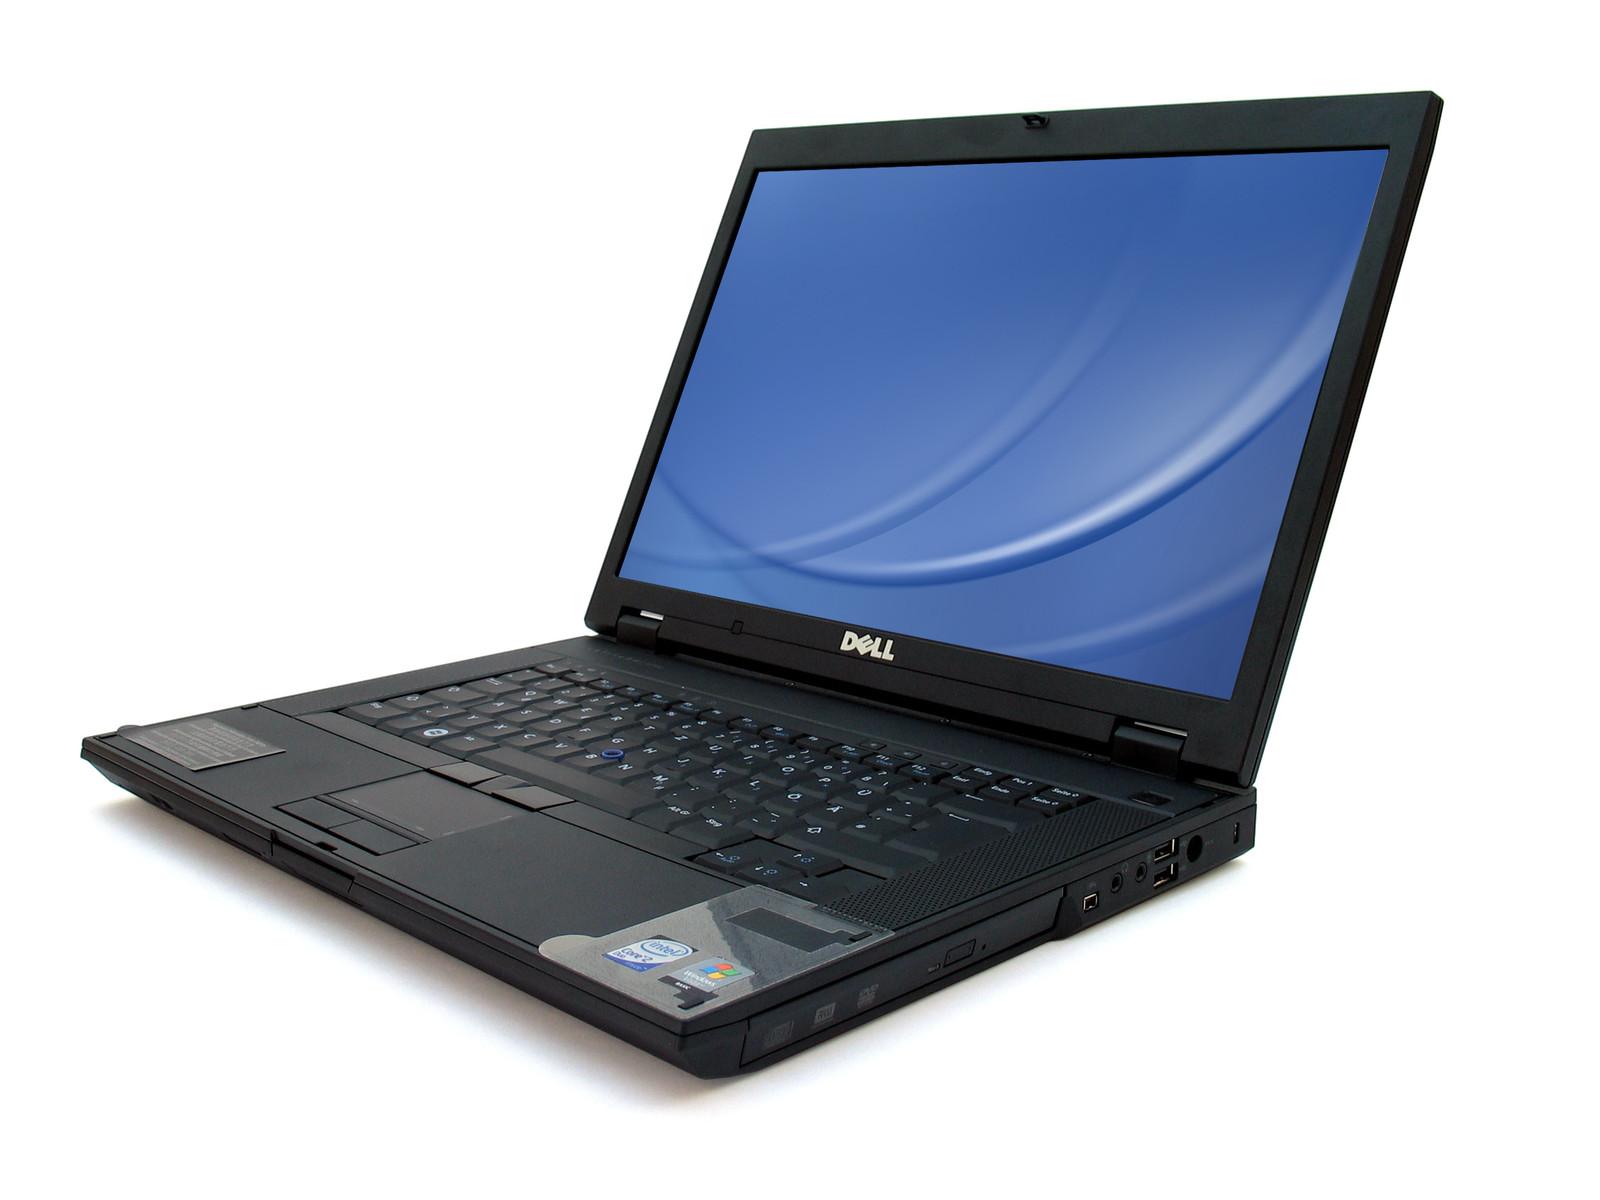 Dell Latitude E5500 Notebookcheck Net External Reviews